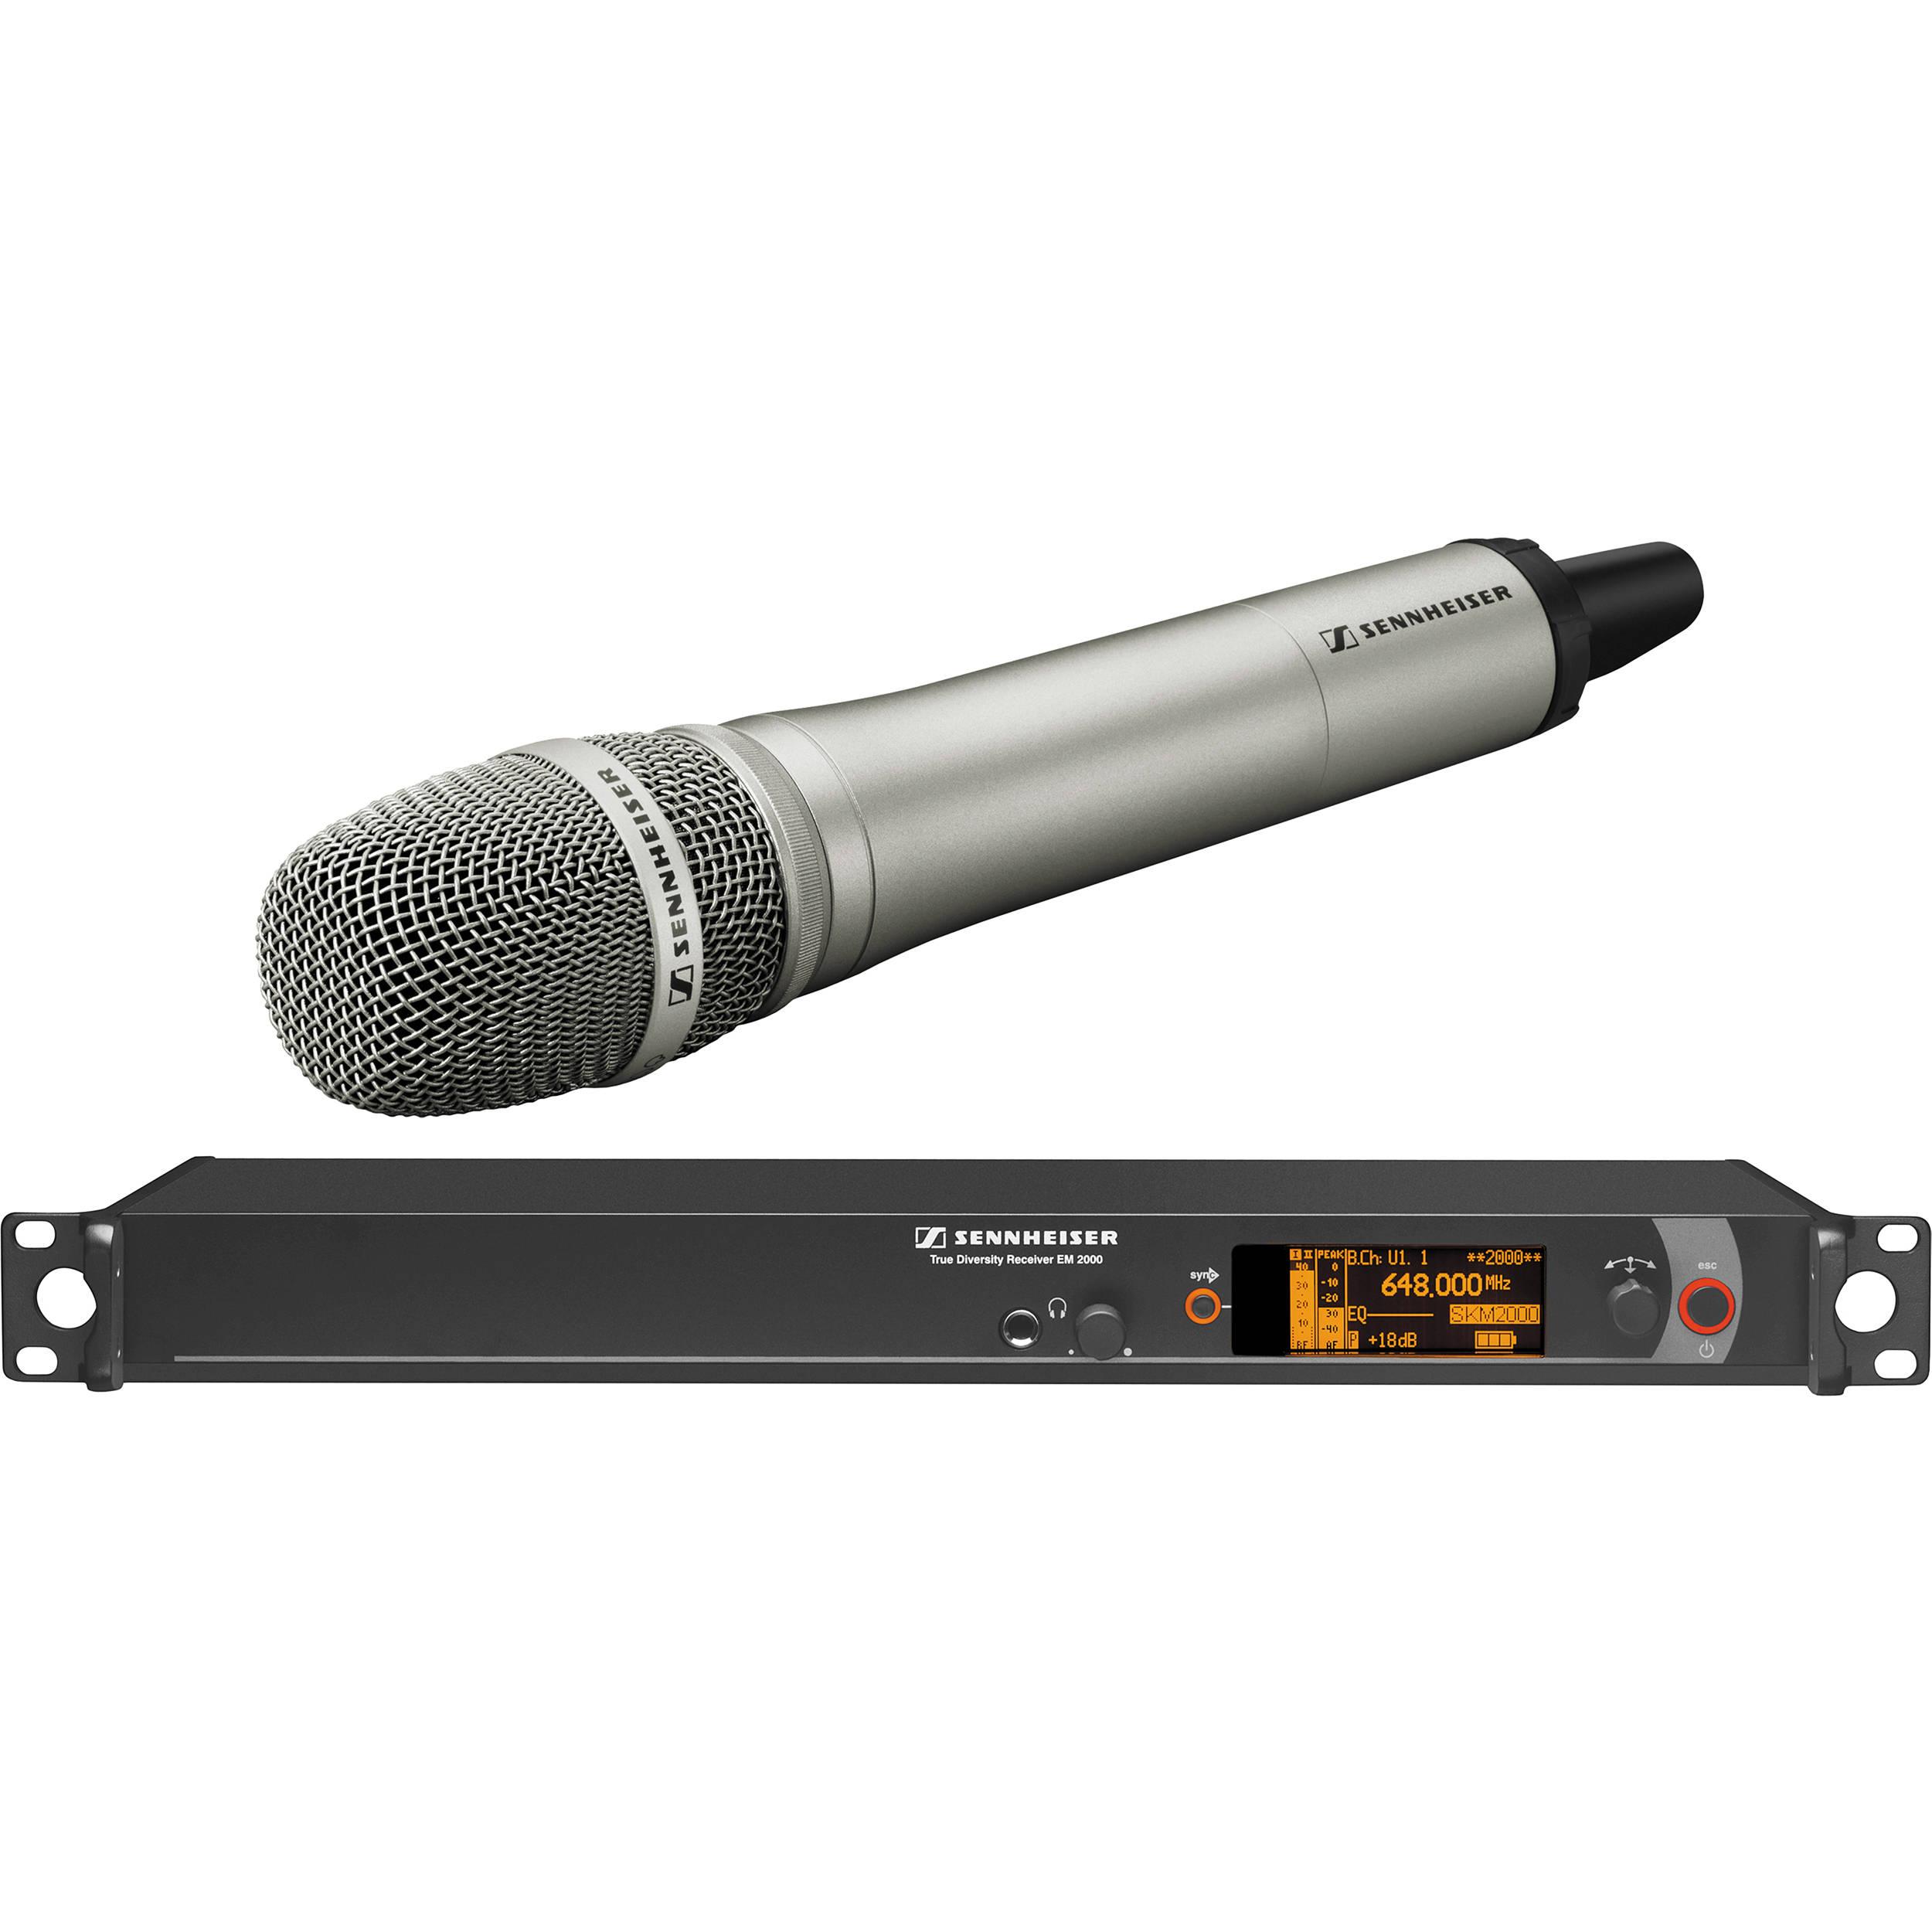 sennheiser 2000 series single handheld wireless 2000h1 205ni a rh bhphotovideo com sennheiser xs wireless microphone manual sennheiser wireless mic ew 100 g3 manual